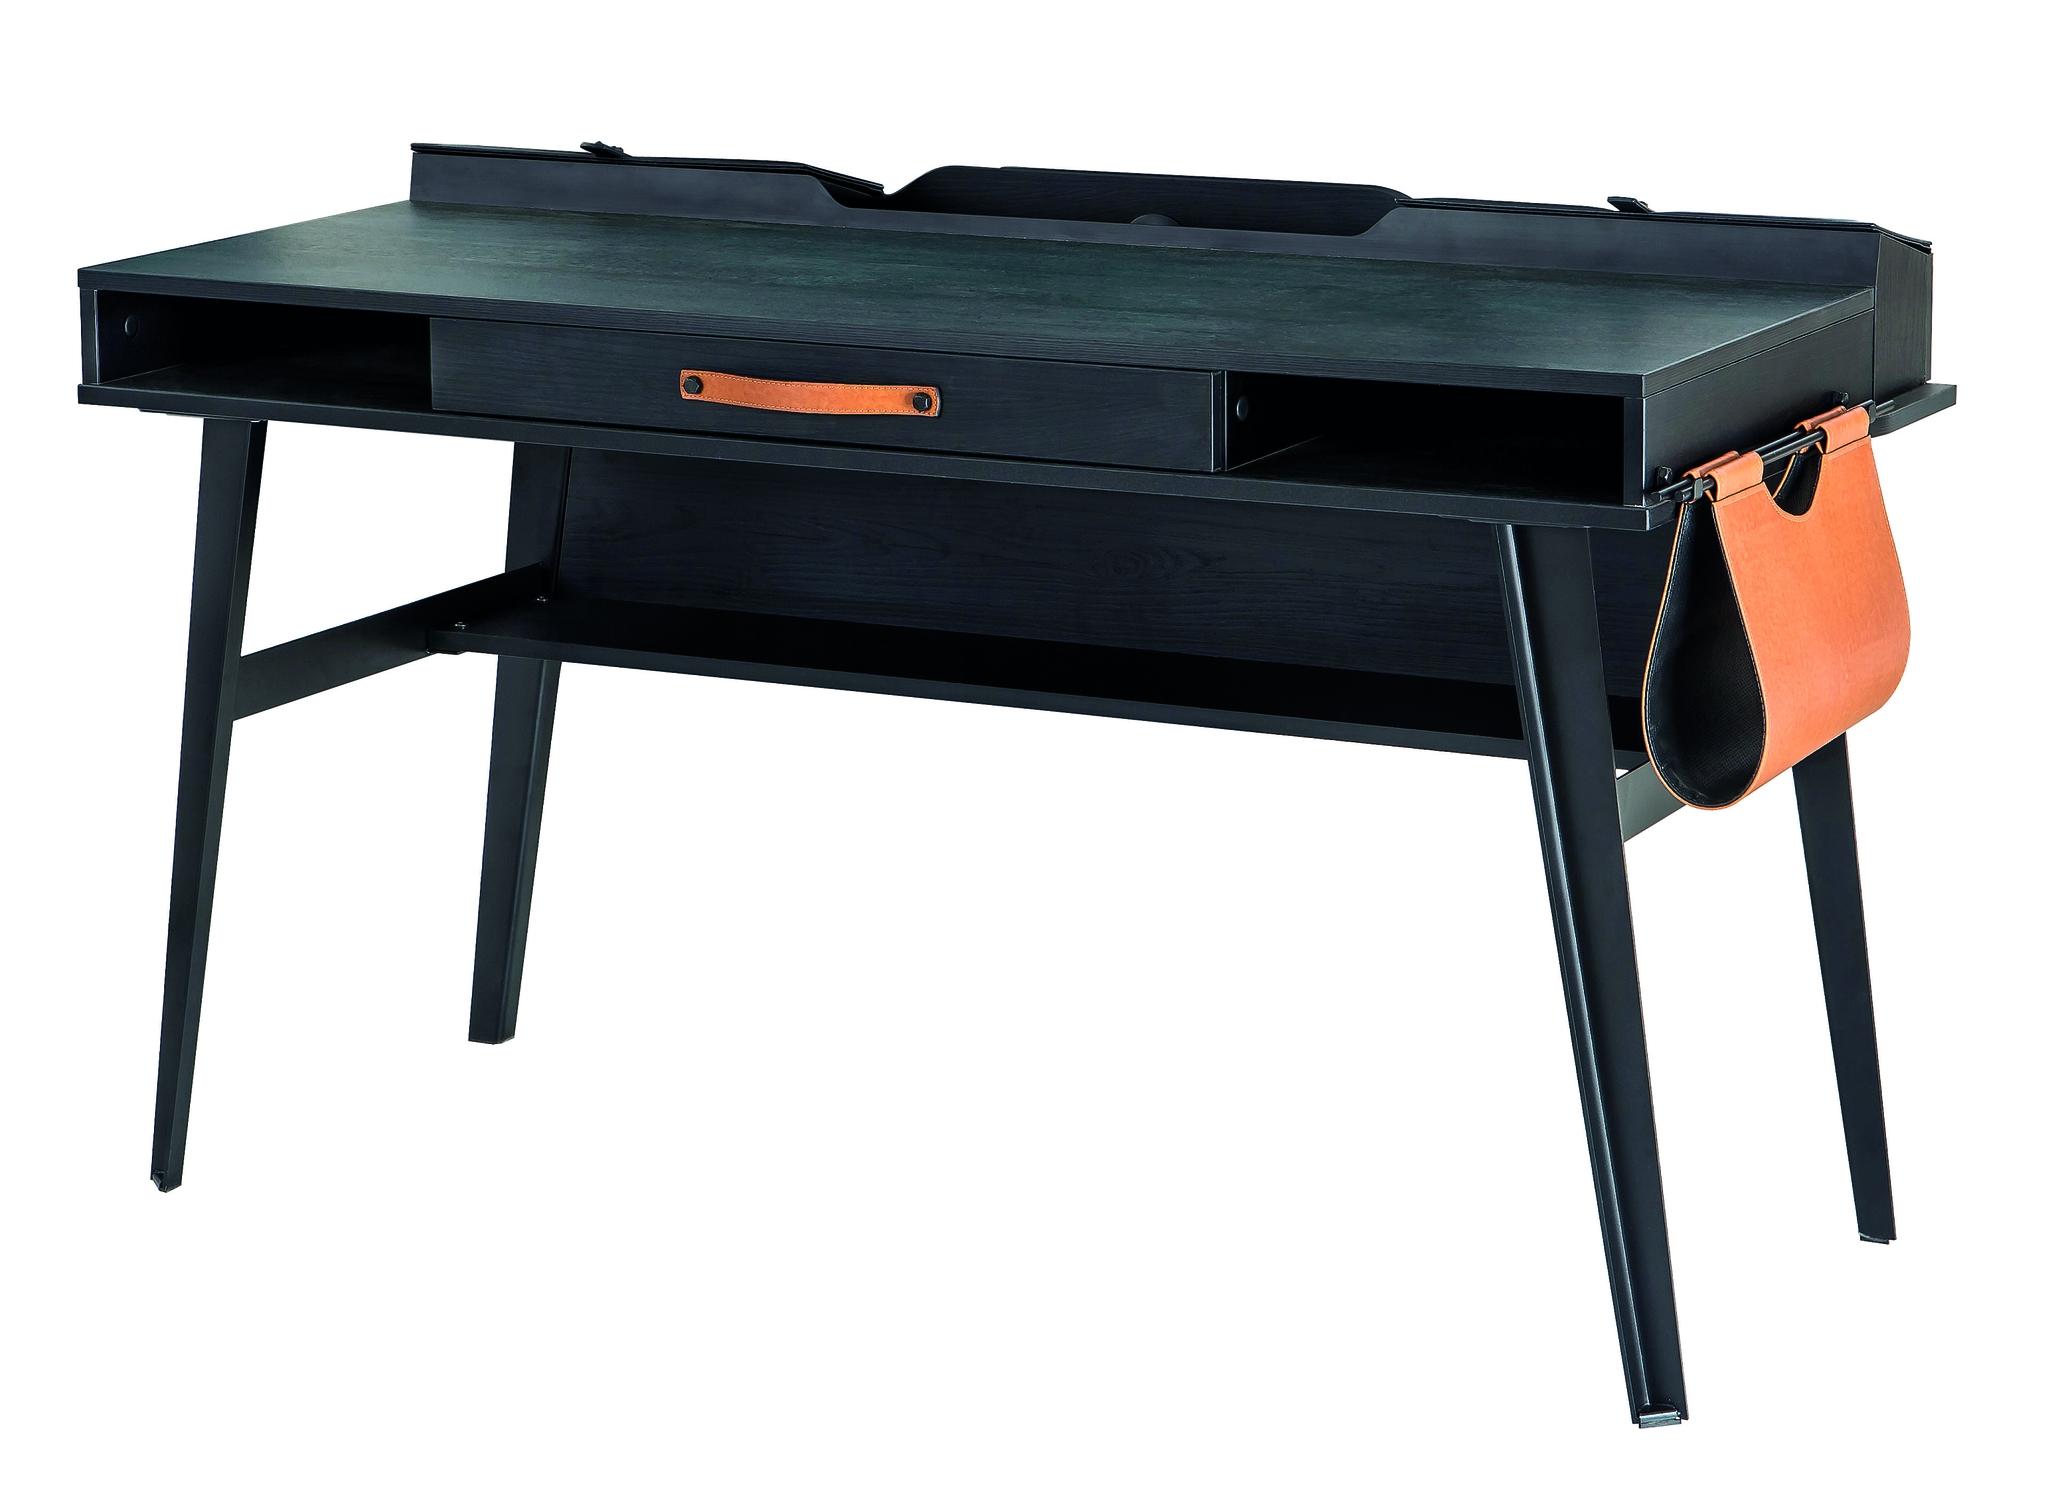 Masa de birou din pal si metal pentru tineret Dark Metal Black / Graphite L134xl62xH80 cm